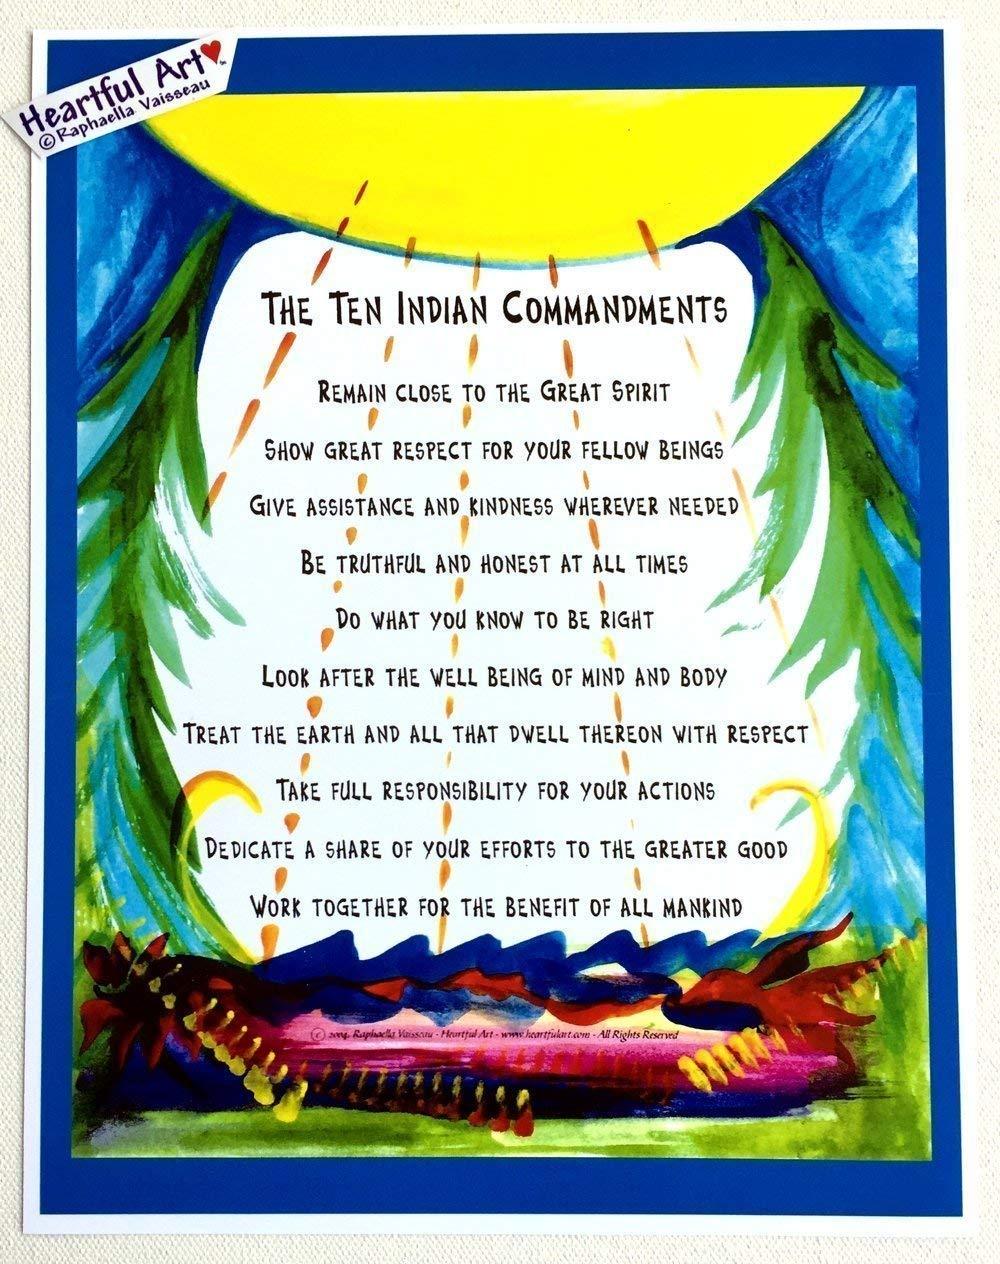 Ten Indian Commandments 8x11 poster - Heartful Art by Raphaella Vaisseau